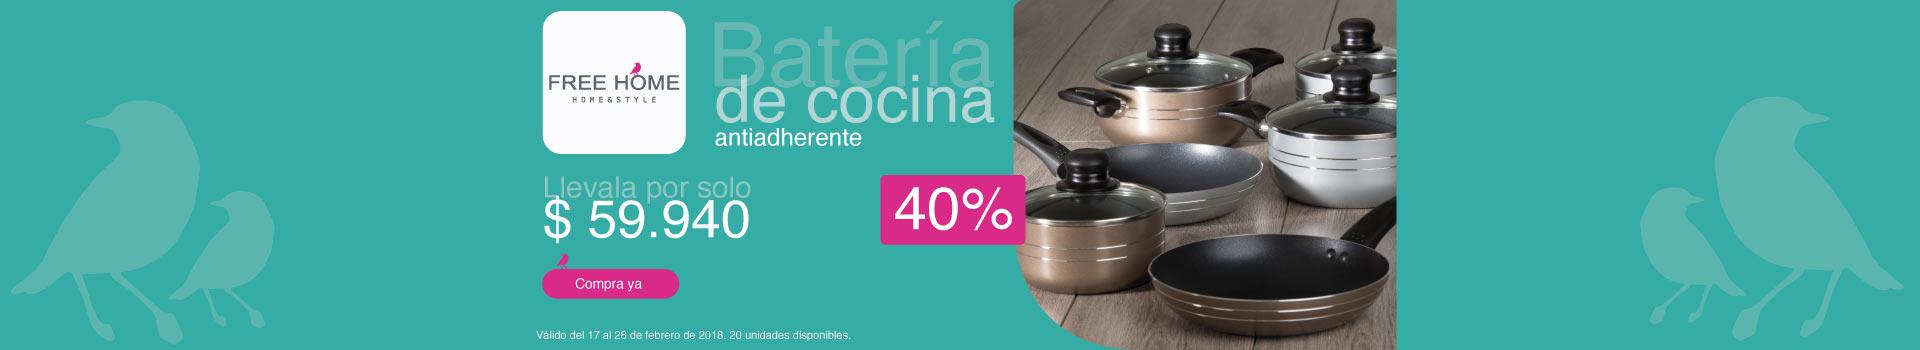 CAT AK-3-cocinaymesa-bateria-cocina-free-home-mar17-20